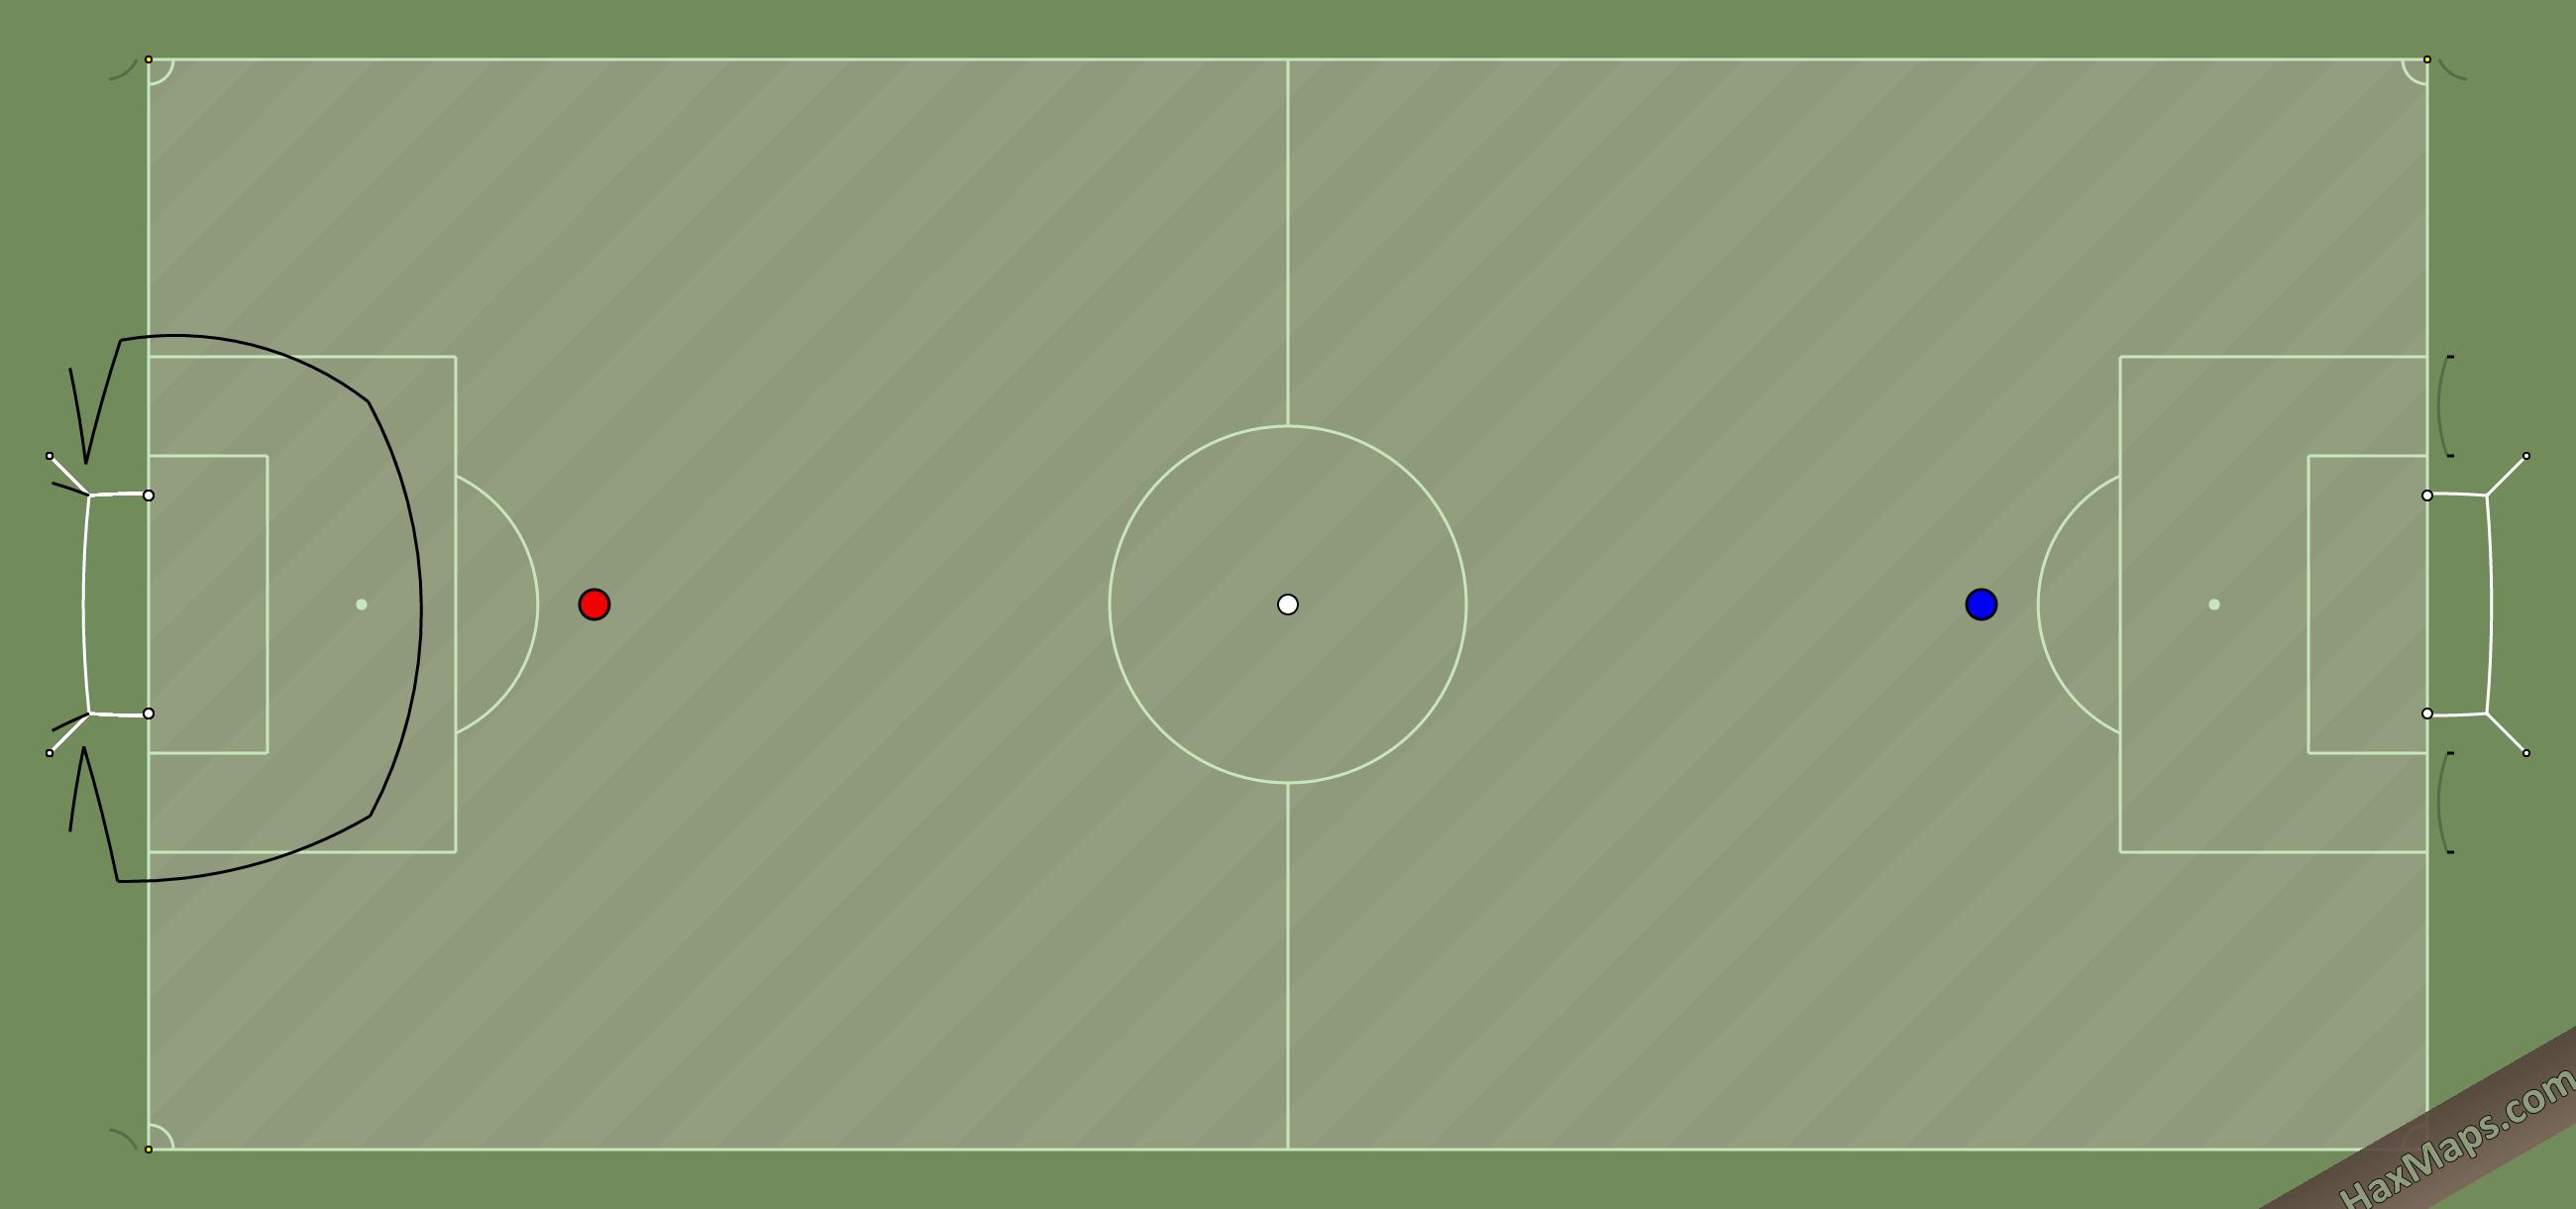 hax ball maps | Real Soccer Goalkeeper Training Fixed